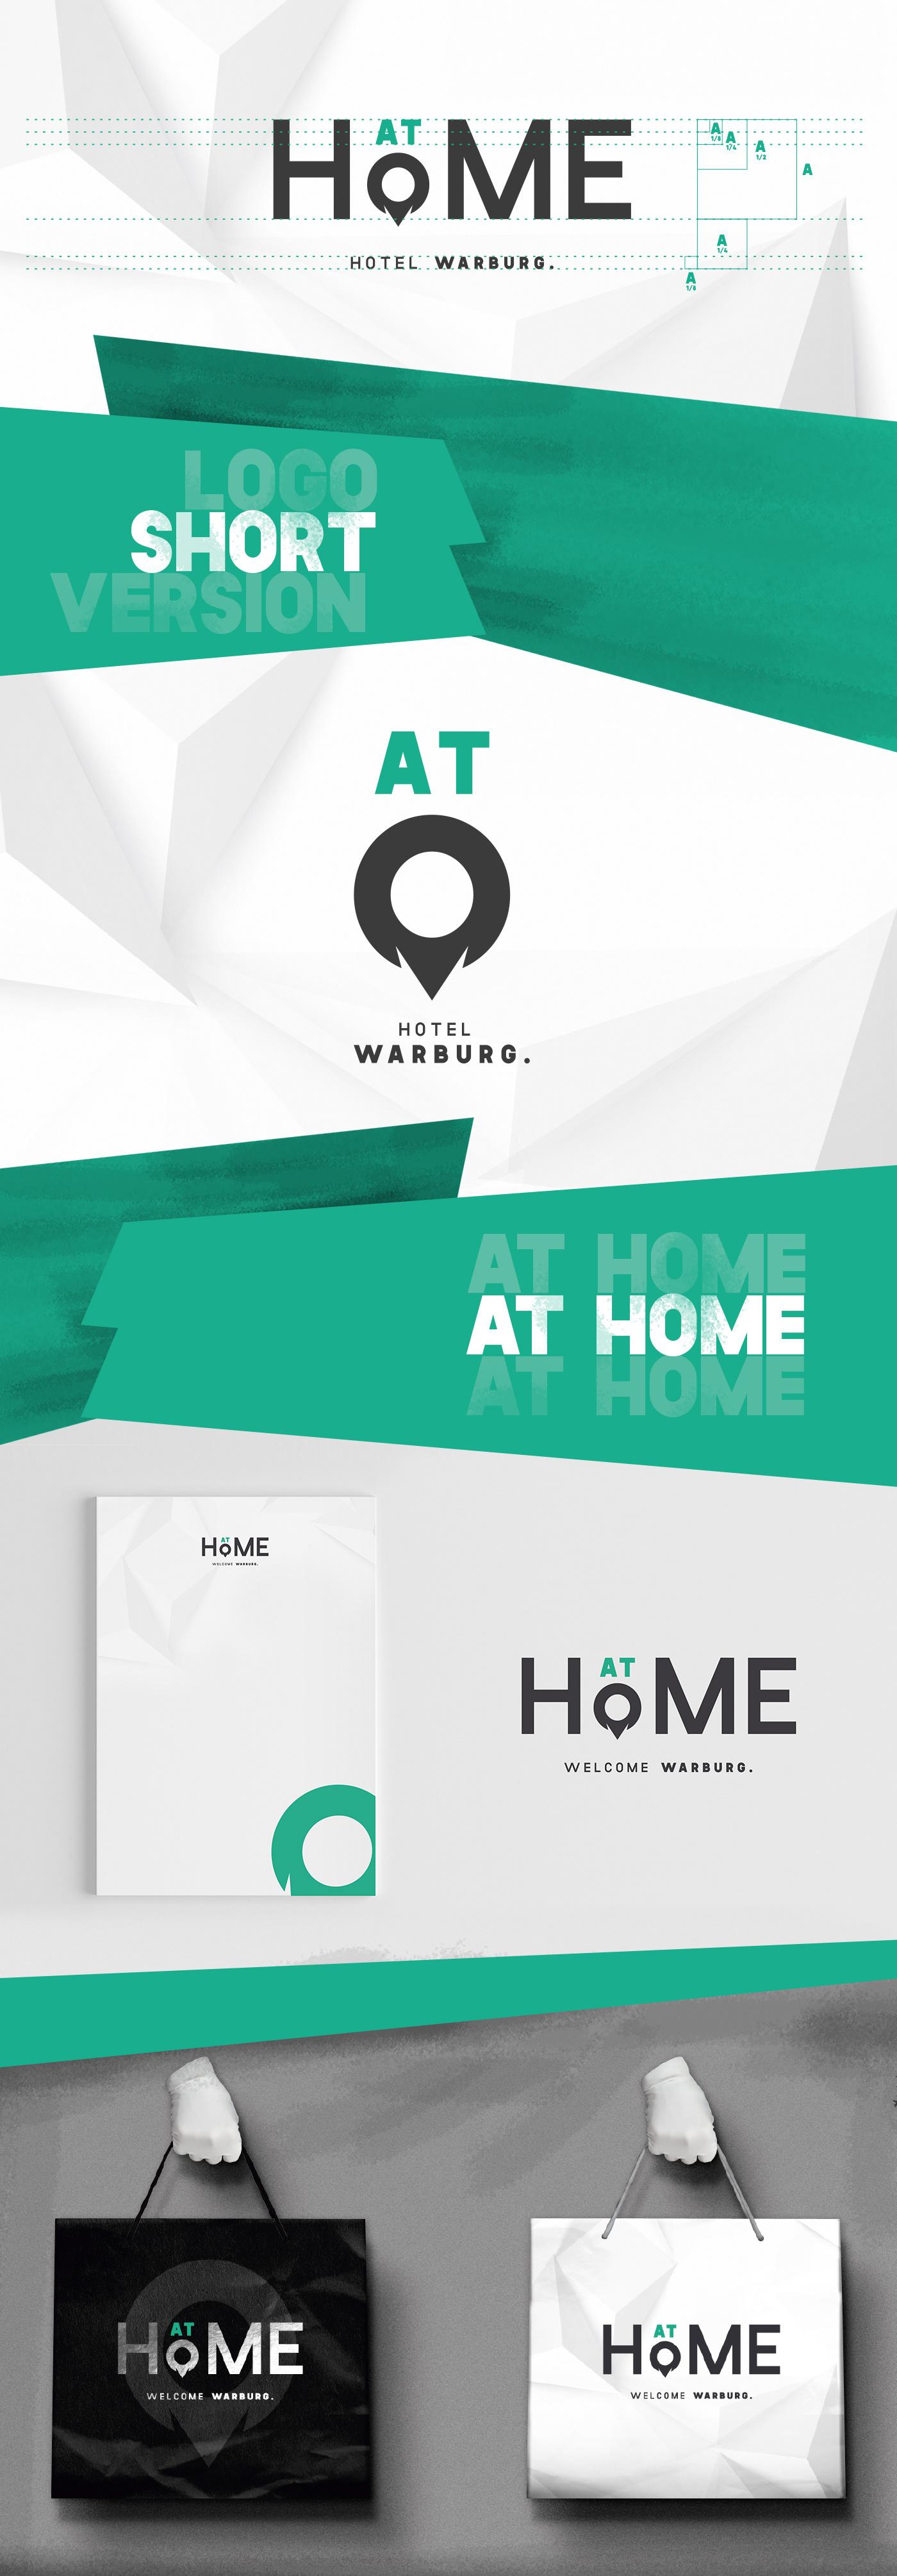 hotel logo Corporate Design branding  design sleep modern Travel home luxury